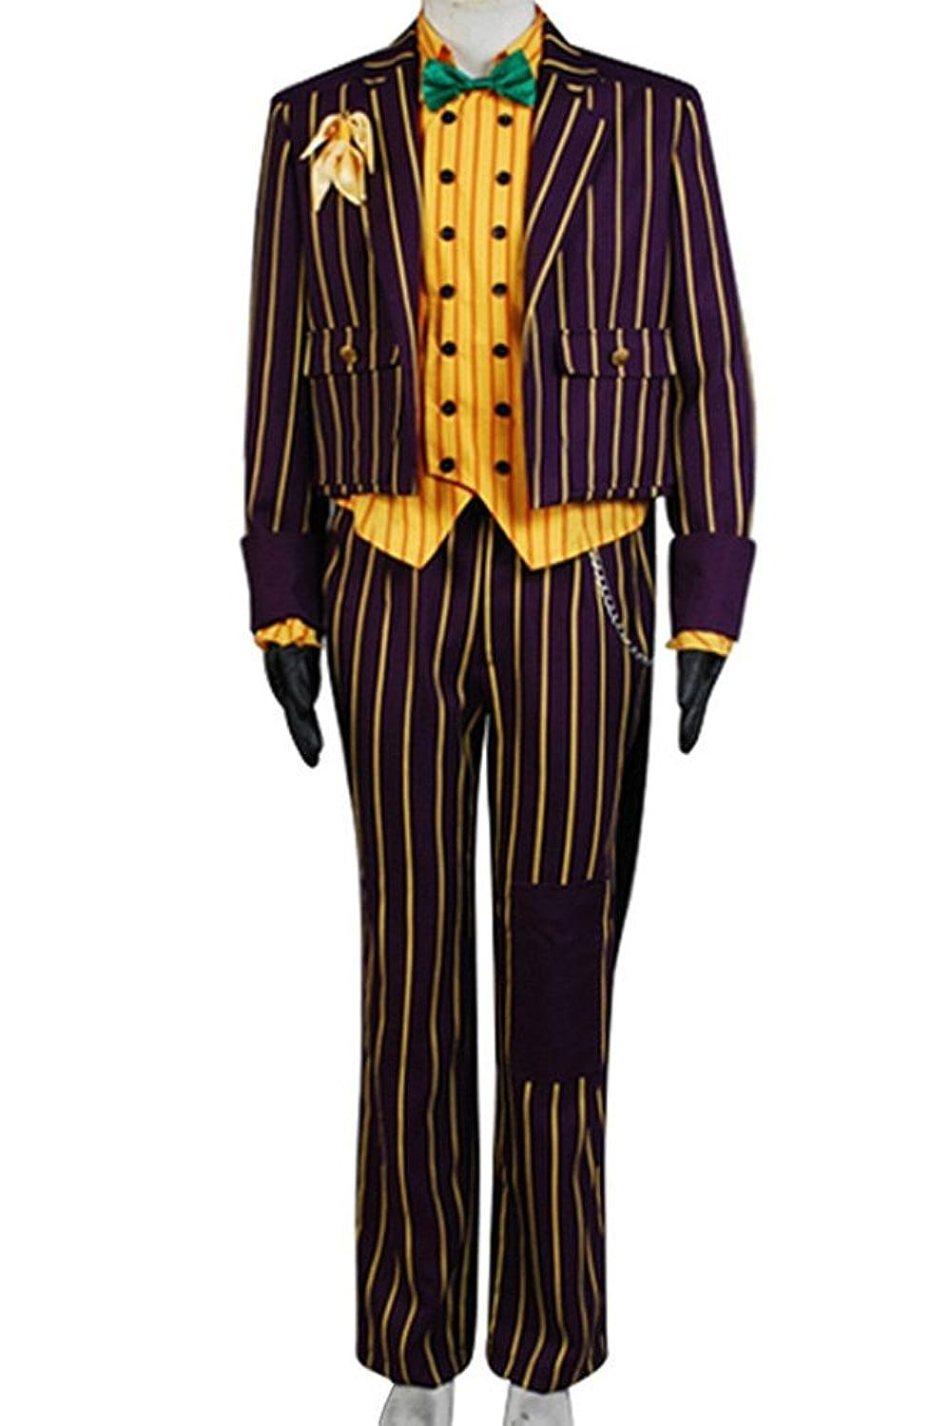 Cosparts Joker Arkham Asylum Cosplay Costume Full Set